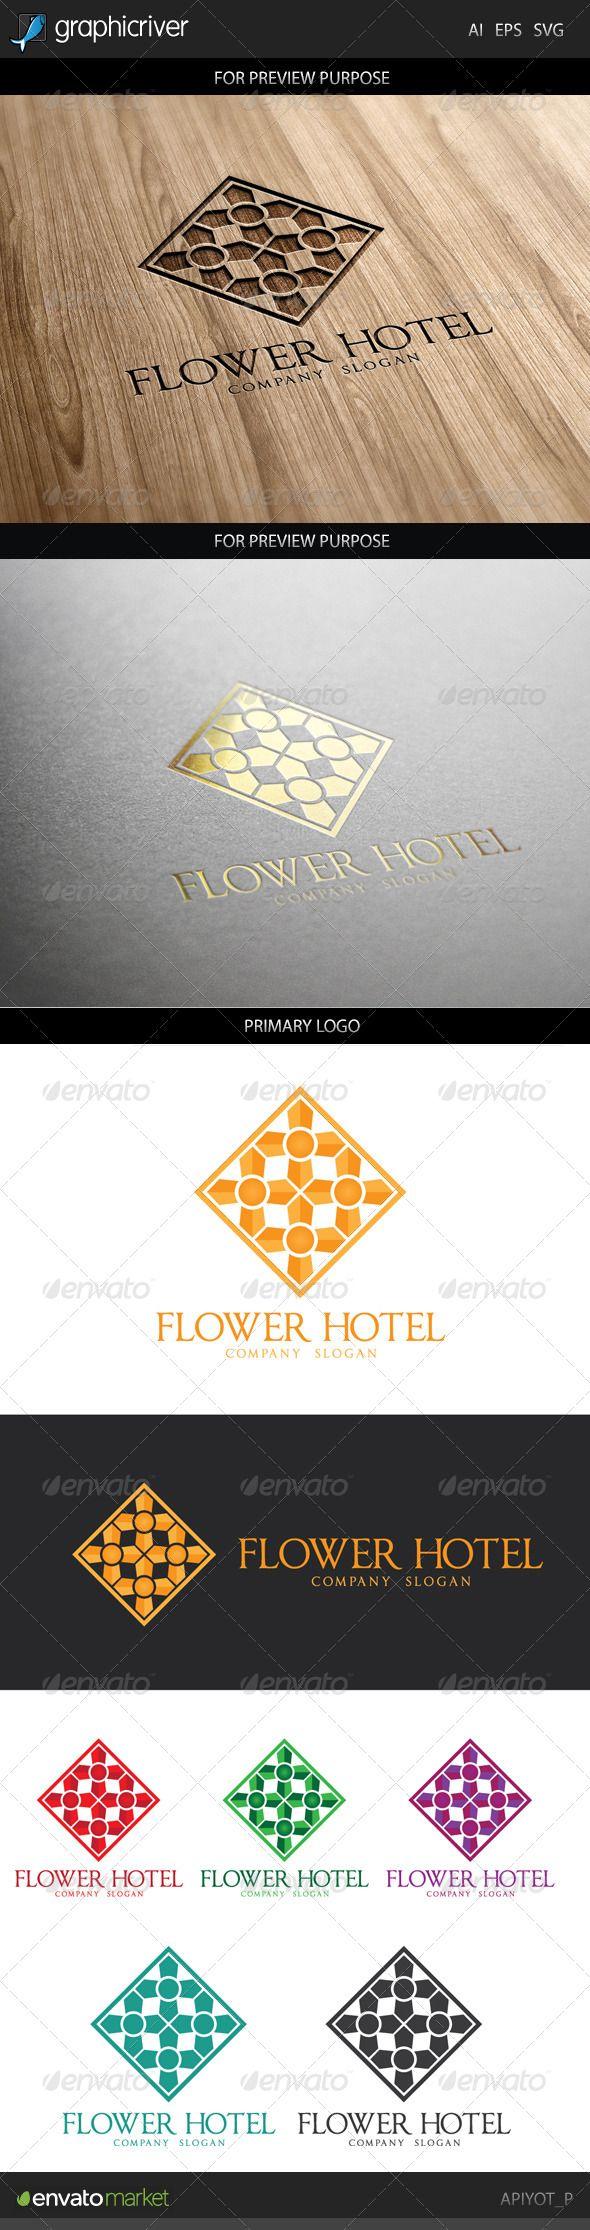 Flower Hotel Logo — Vector EPS #plan #learning • Available here → https://graphicriver.net/item/flower-hotel-logo/8748166?ref=pxcr